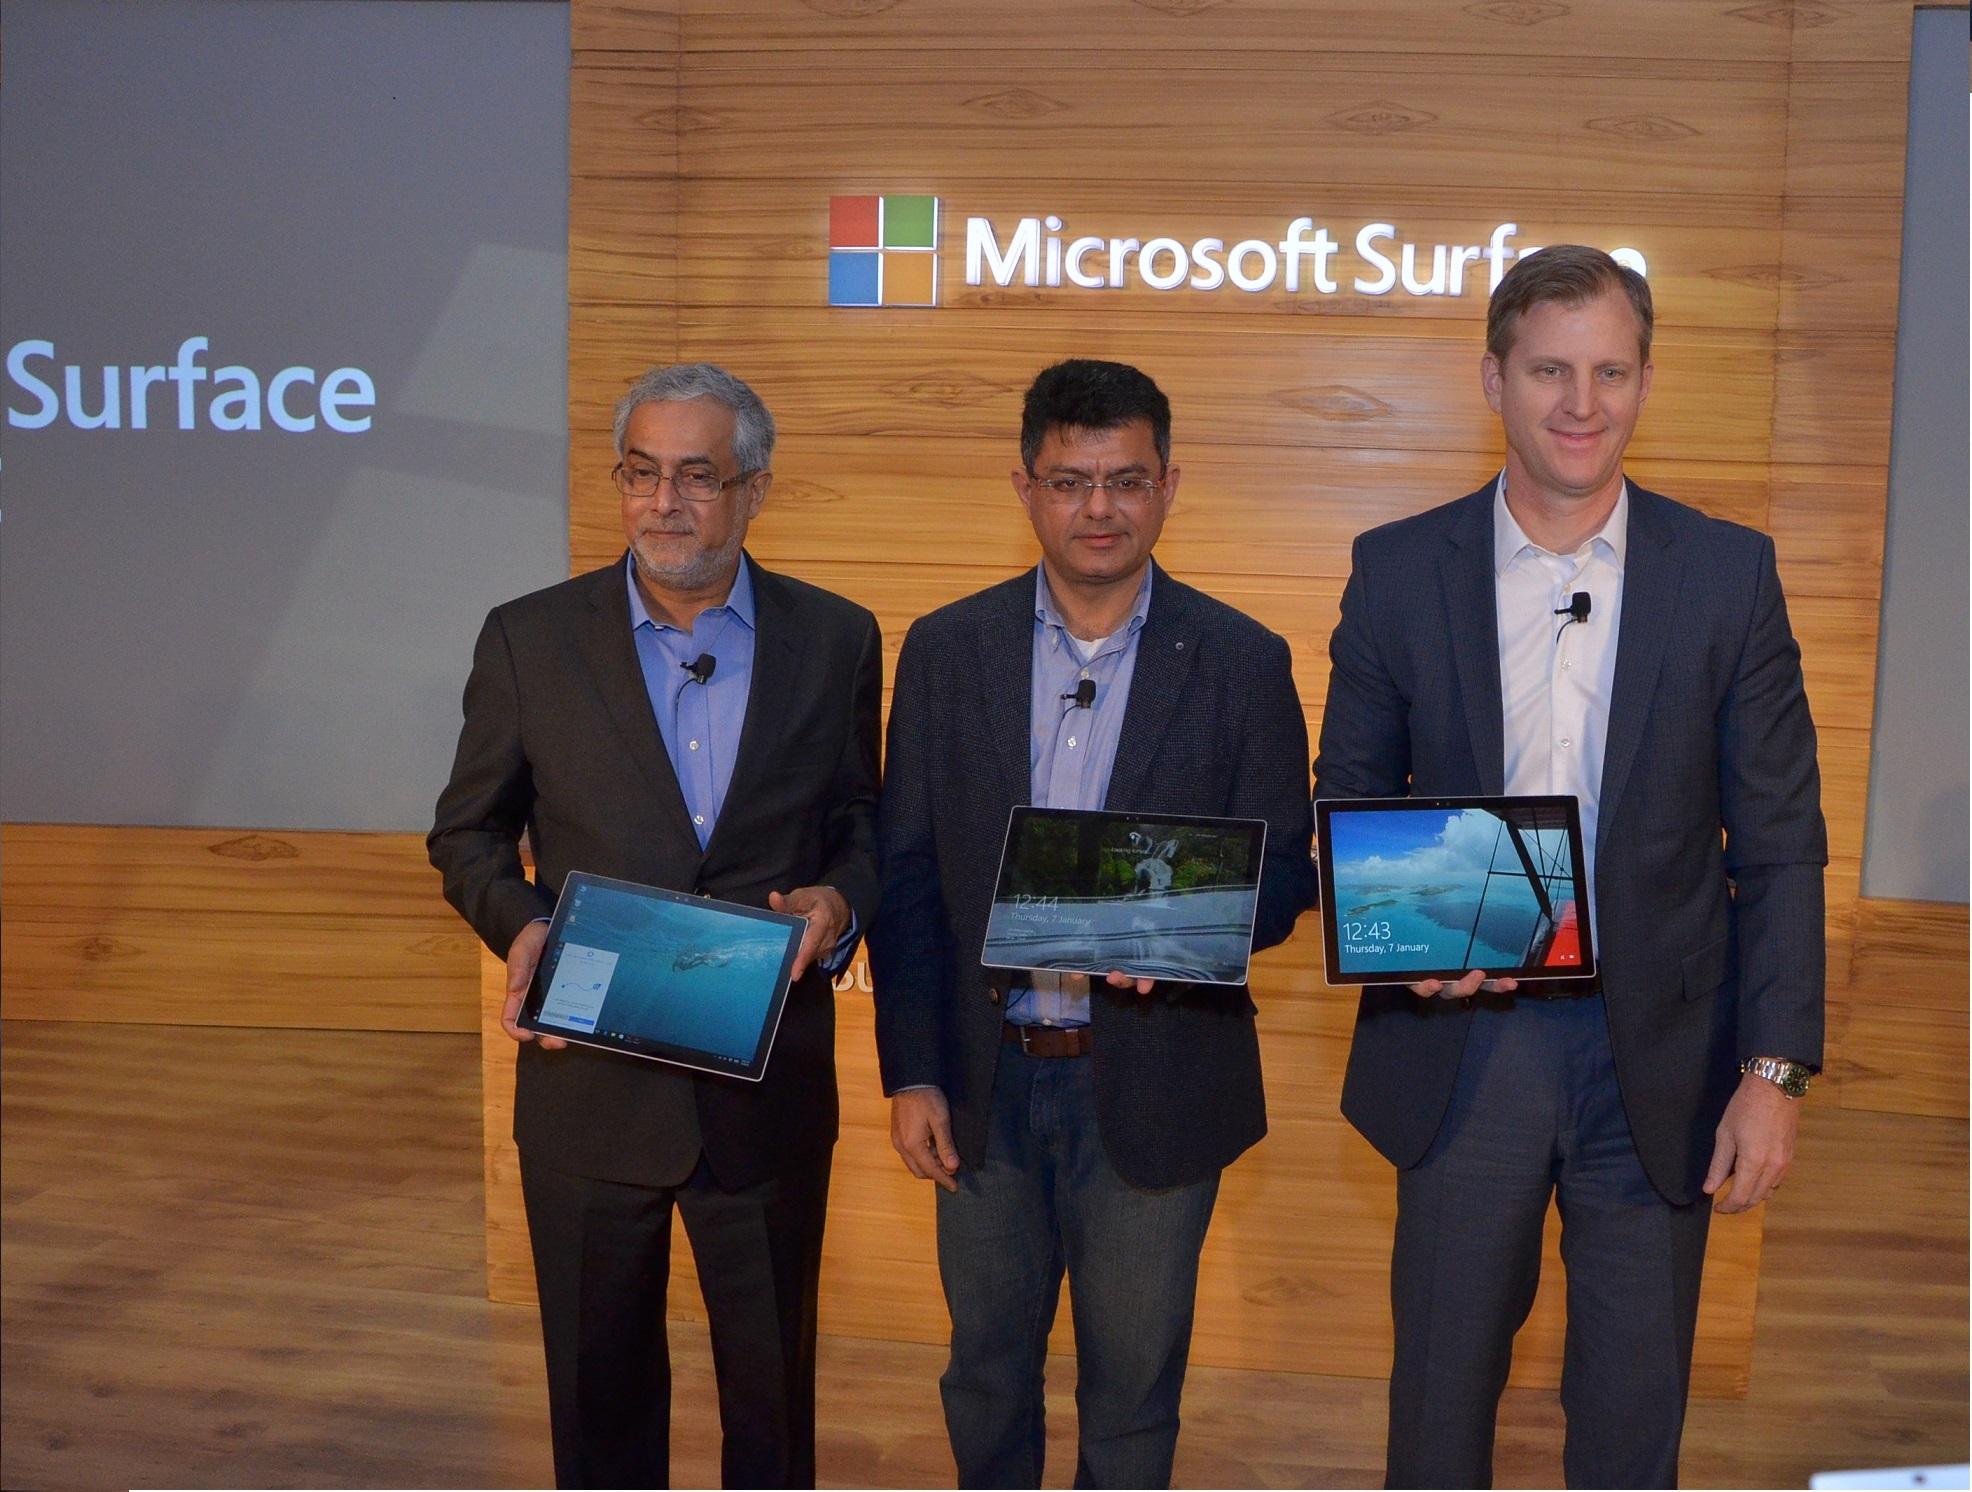 Bhaskar Pramanik, Chairman Microsoft India launching the Surface Pro 4 -...